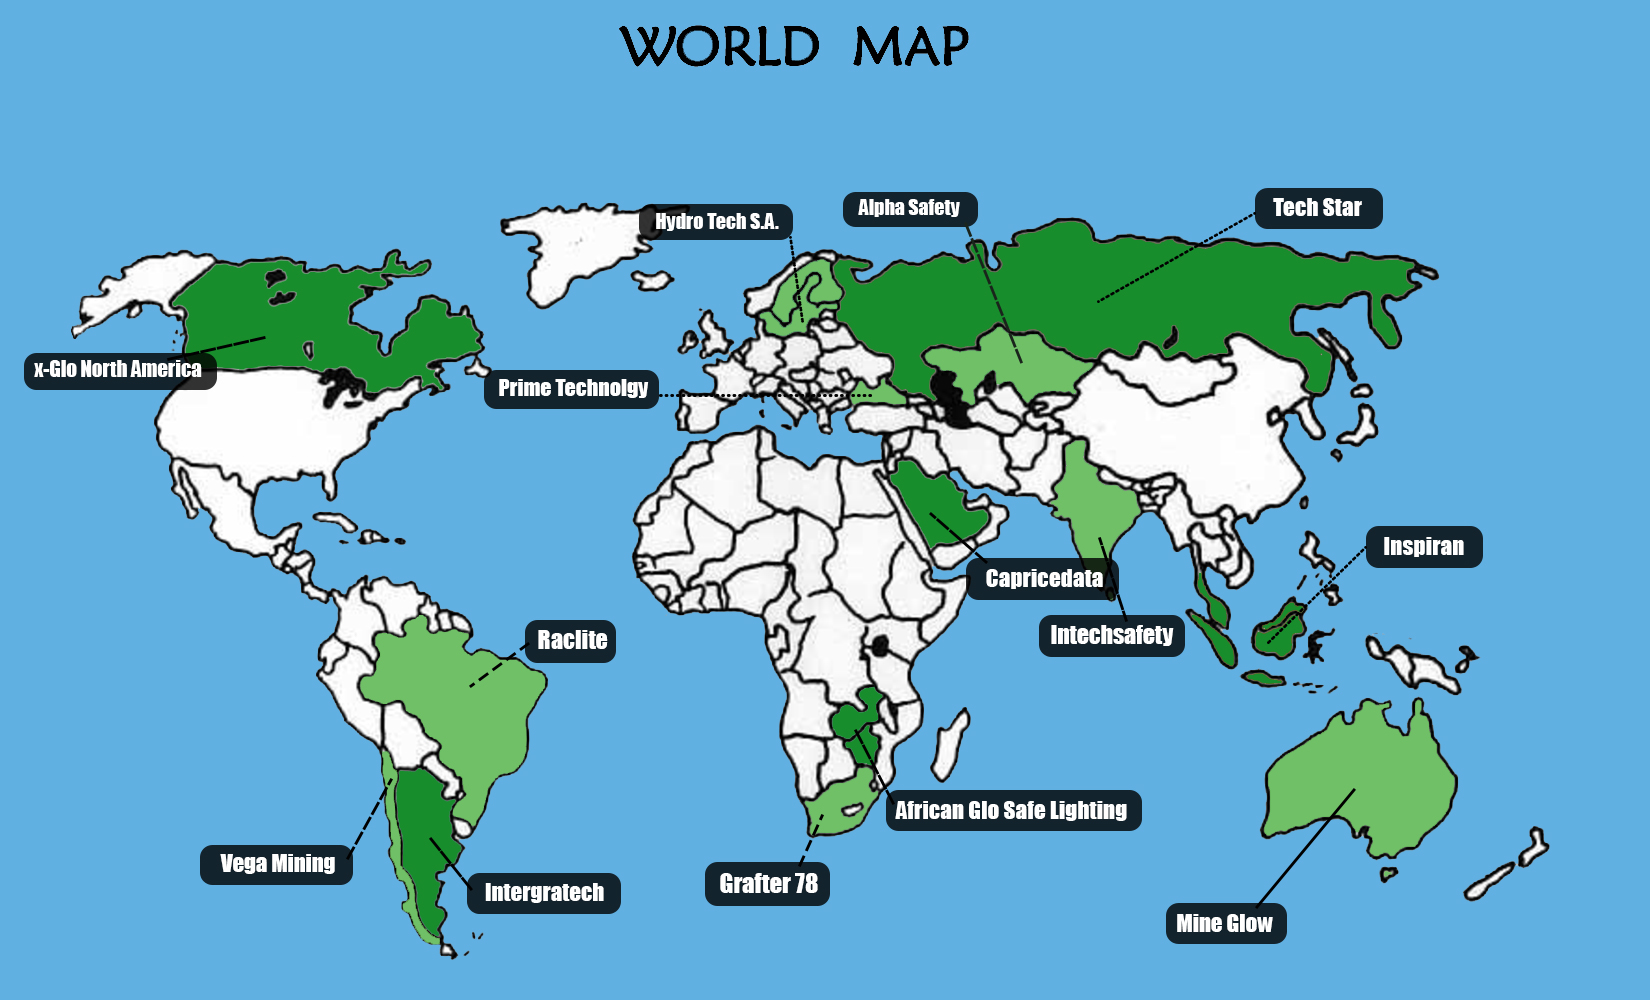 World Map Distrobutors - JPG